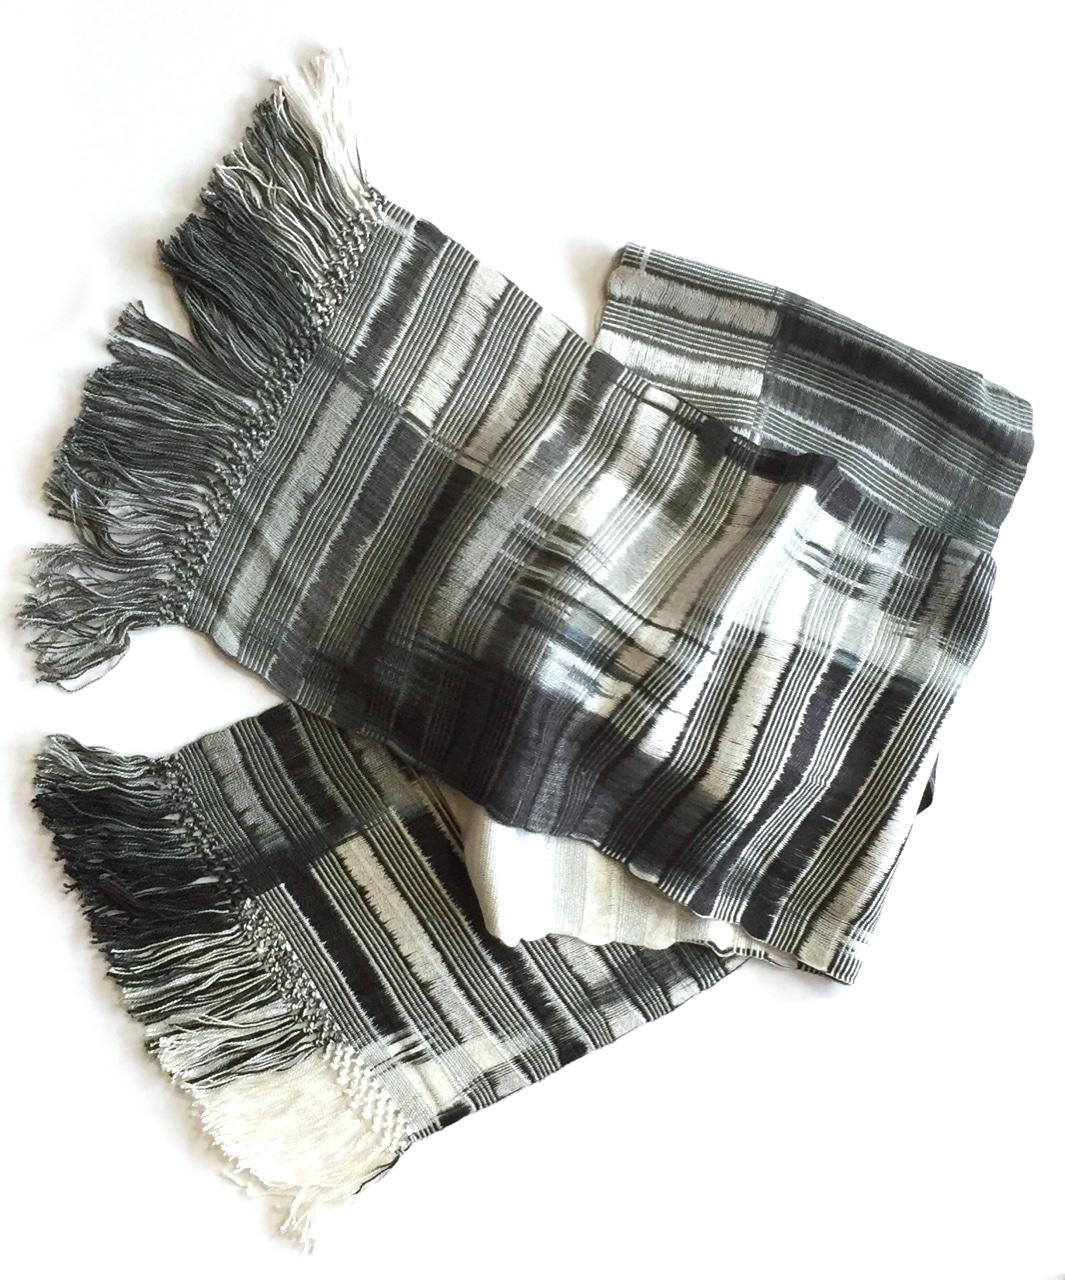 Black, White, Grays - Lightweight Bamboo Open-Weave Handwoven Scarf 8 x 68